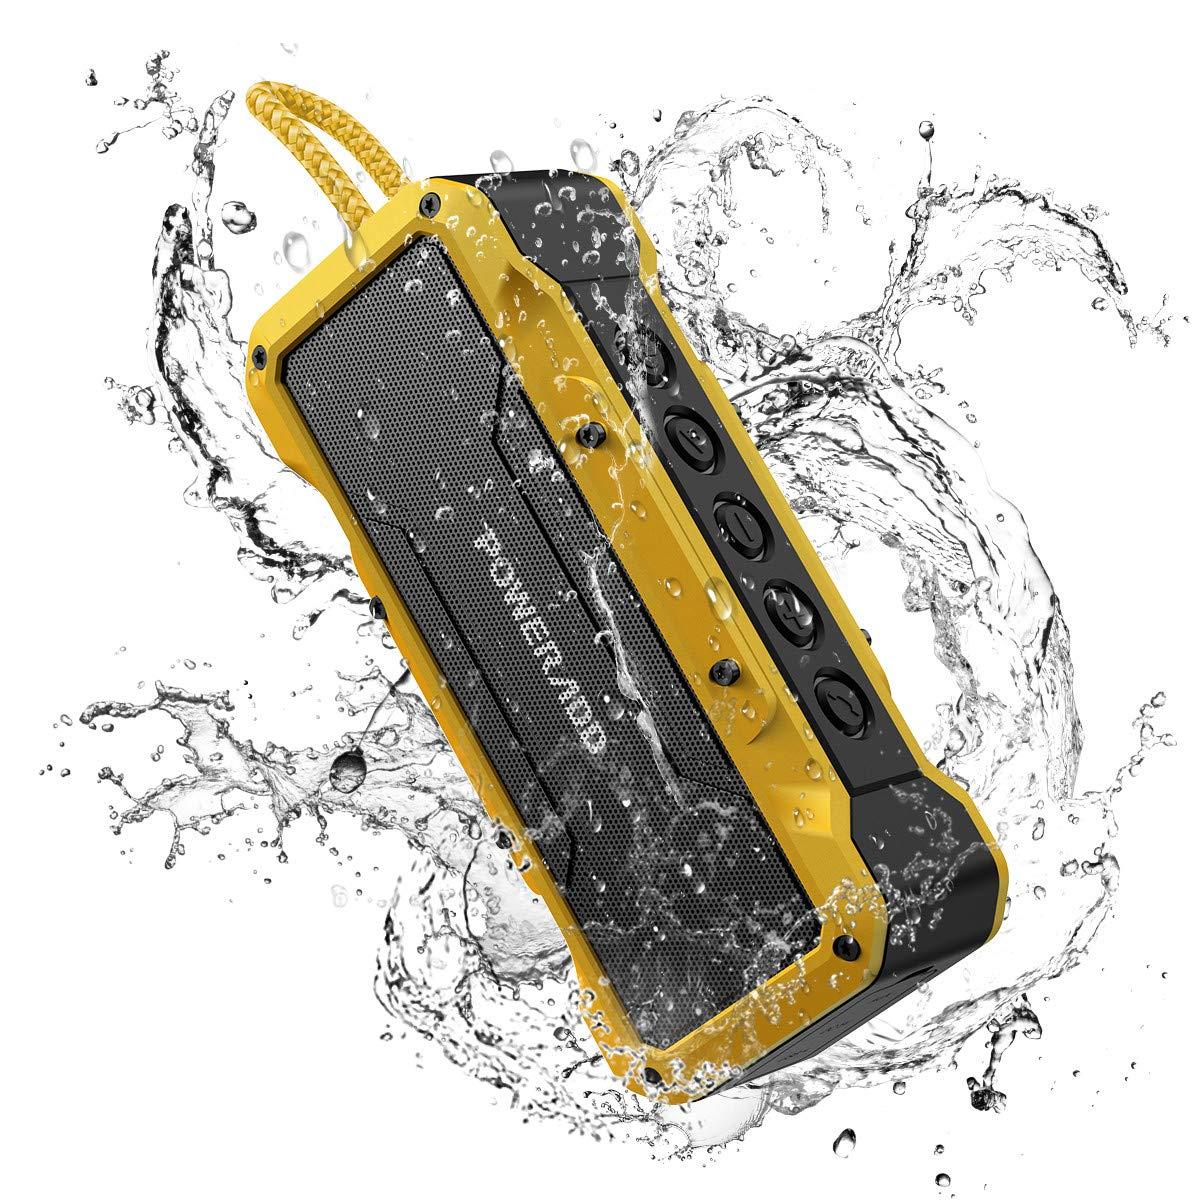 POWERADD Altavoz Sonido Potente de 36W, Altavoz Bluetooth Portátil de Impermeable IPX7,Antigolpes,Resisdente a Arena,con Aux Cable, Amarillo-Negro